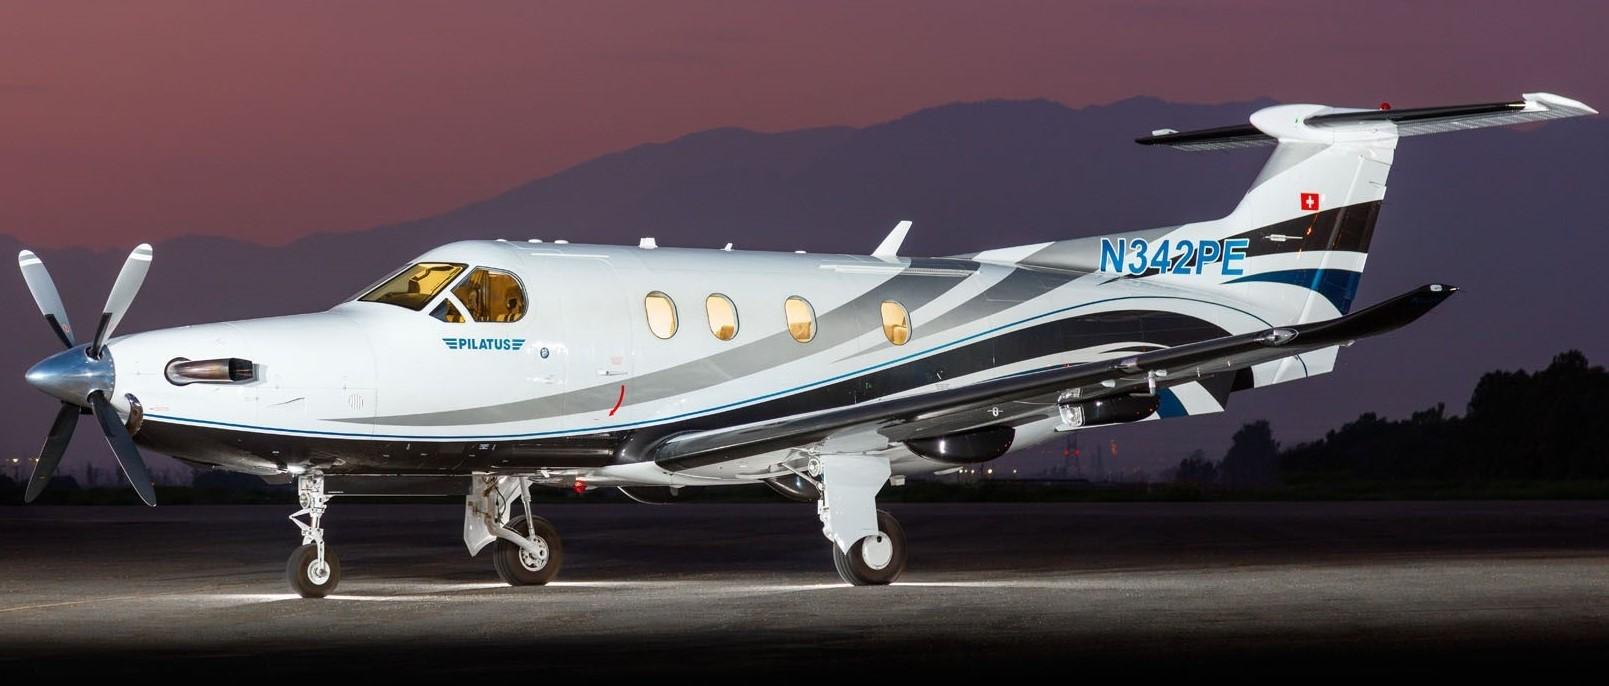 2012 Pilatus PC-12 NG - S/N: 1342 - N342PE - Cutter Aircraft Sales